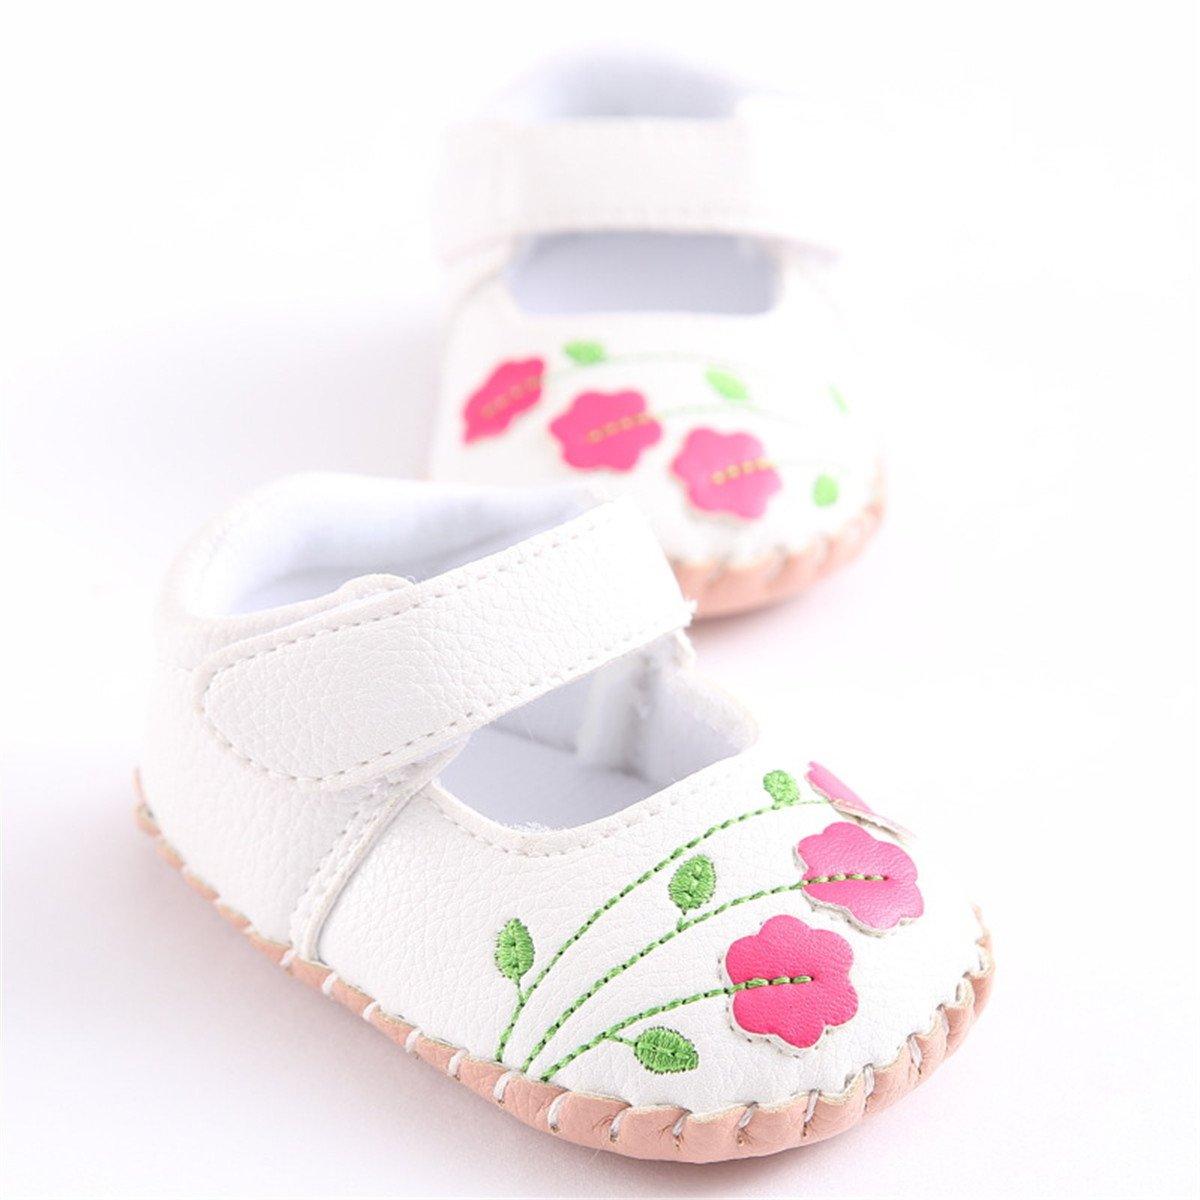 Meckior Infant Baby Girls Sandas Summer Soft Leather No-Slip Princess Shoes